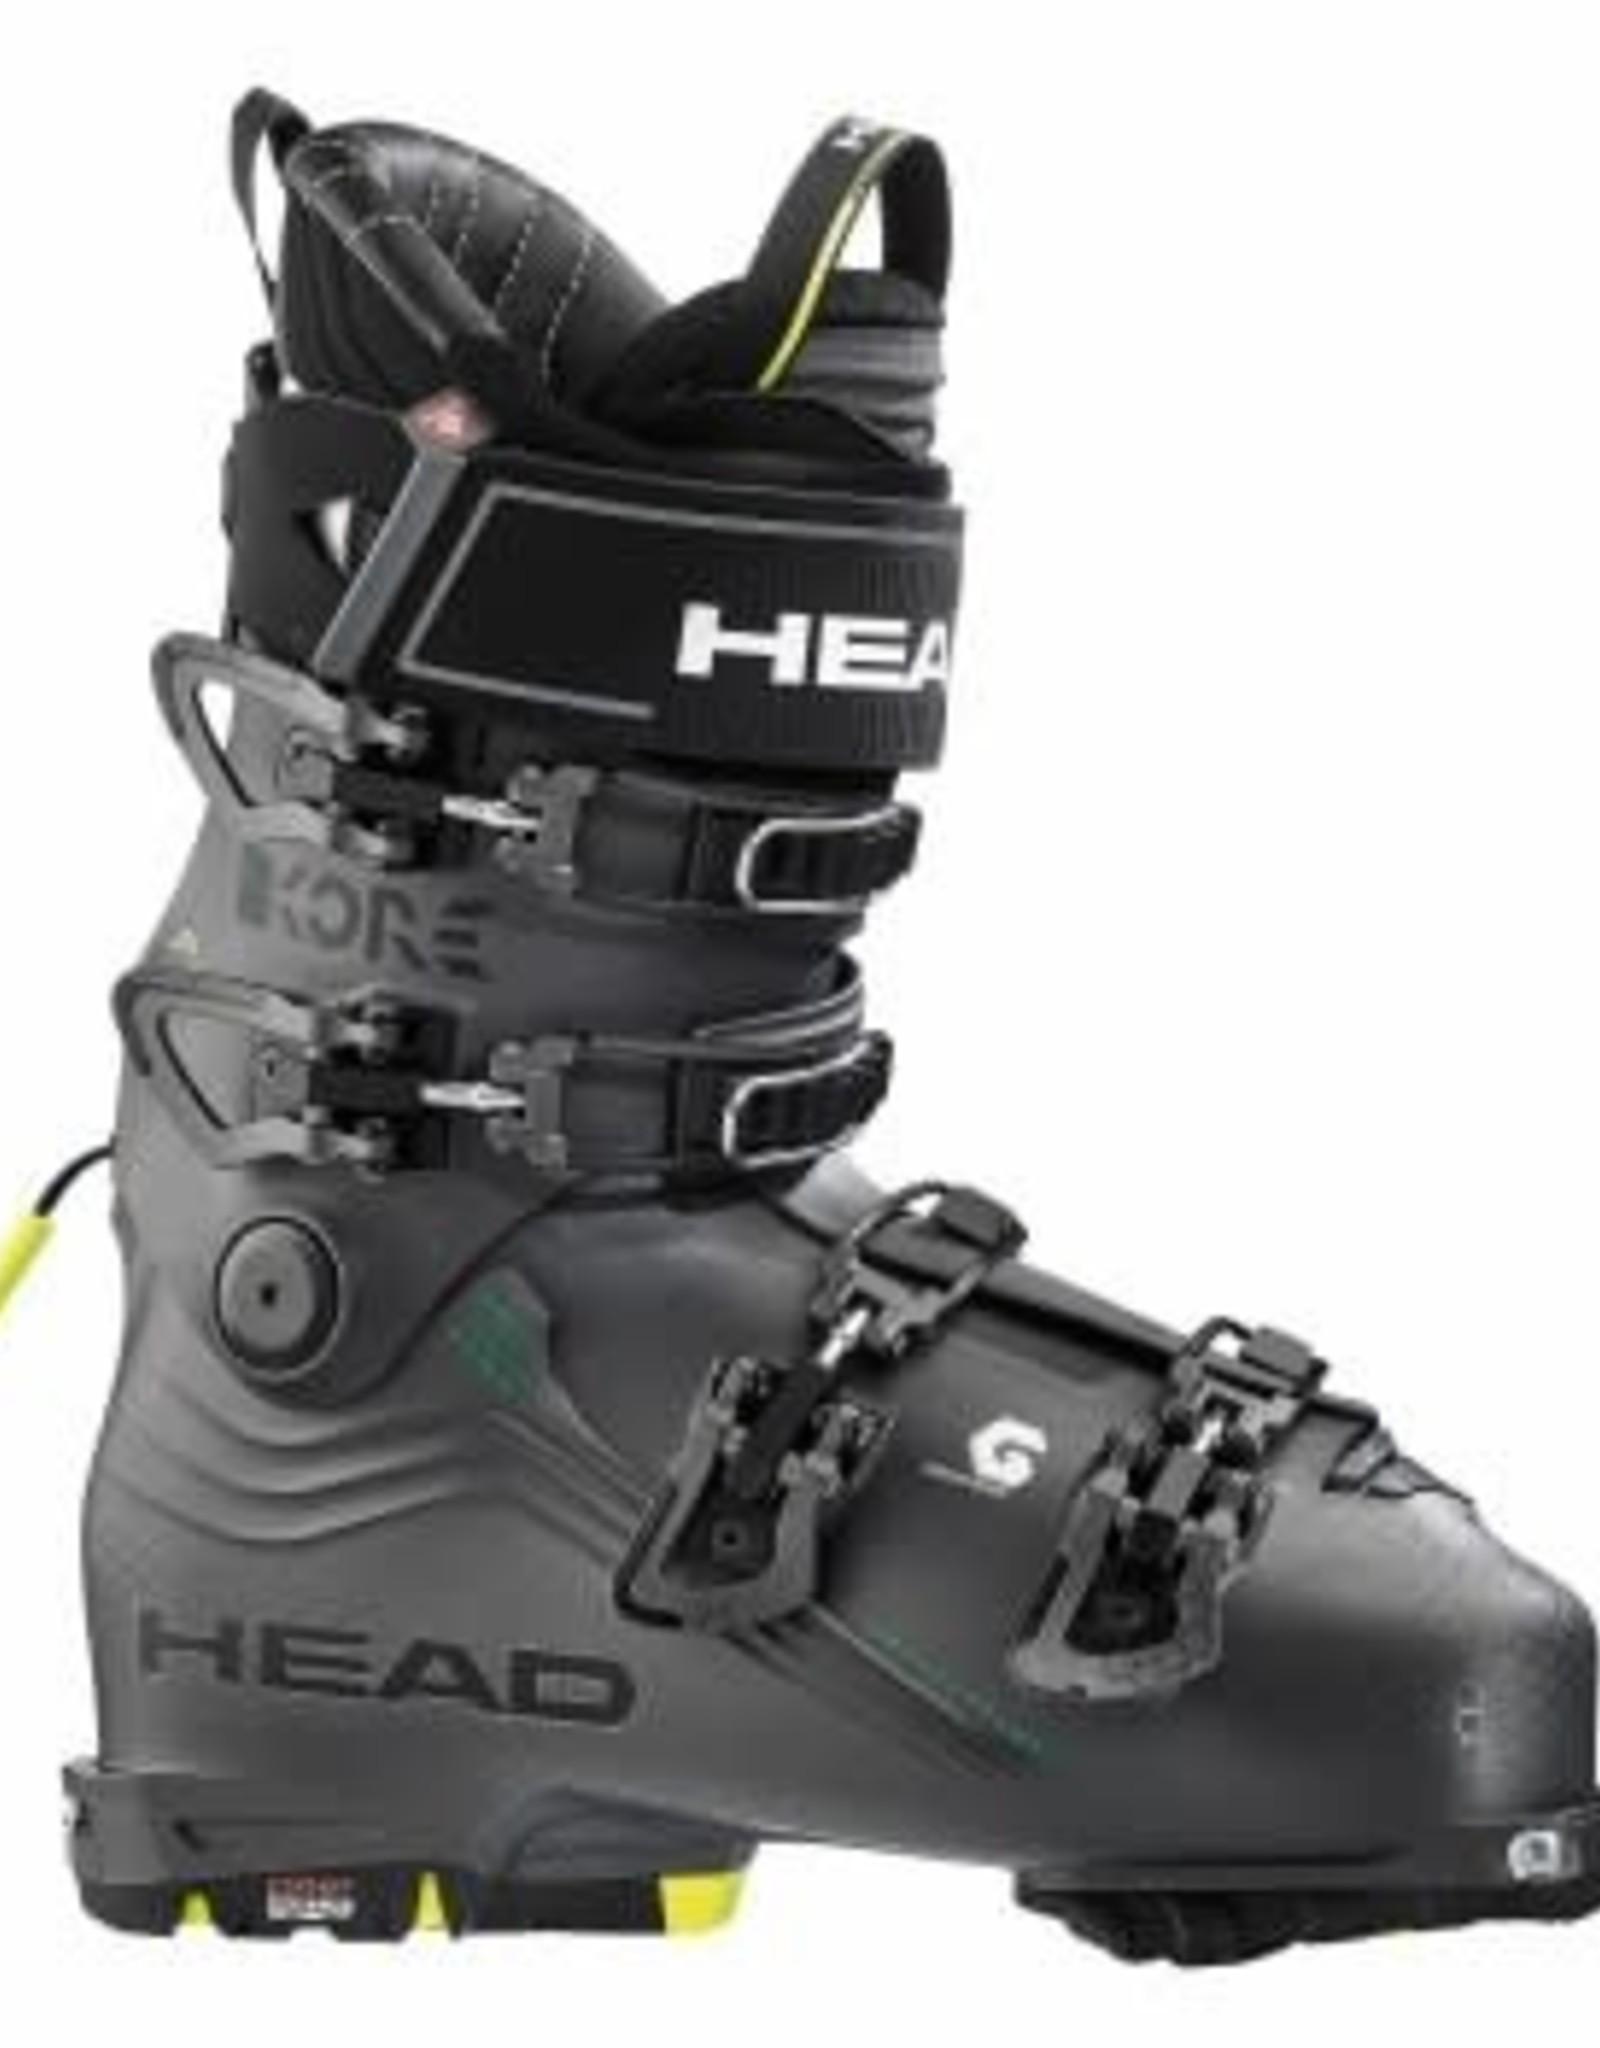 HEAD HEAD Ski Boots KORE 1 (19/20)